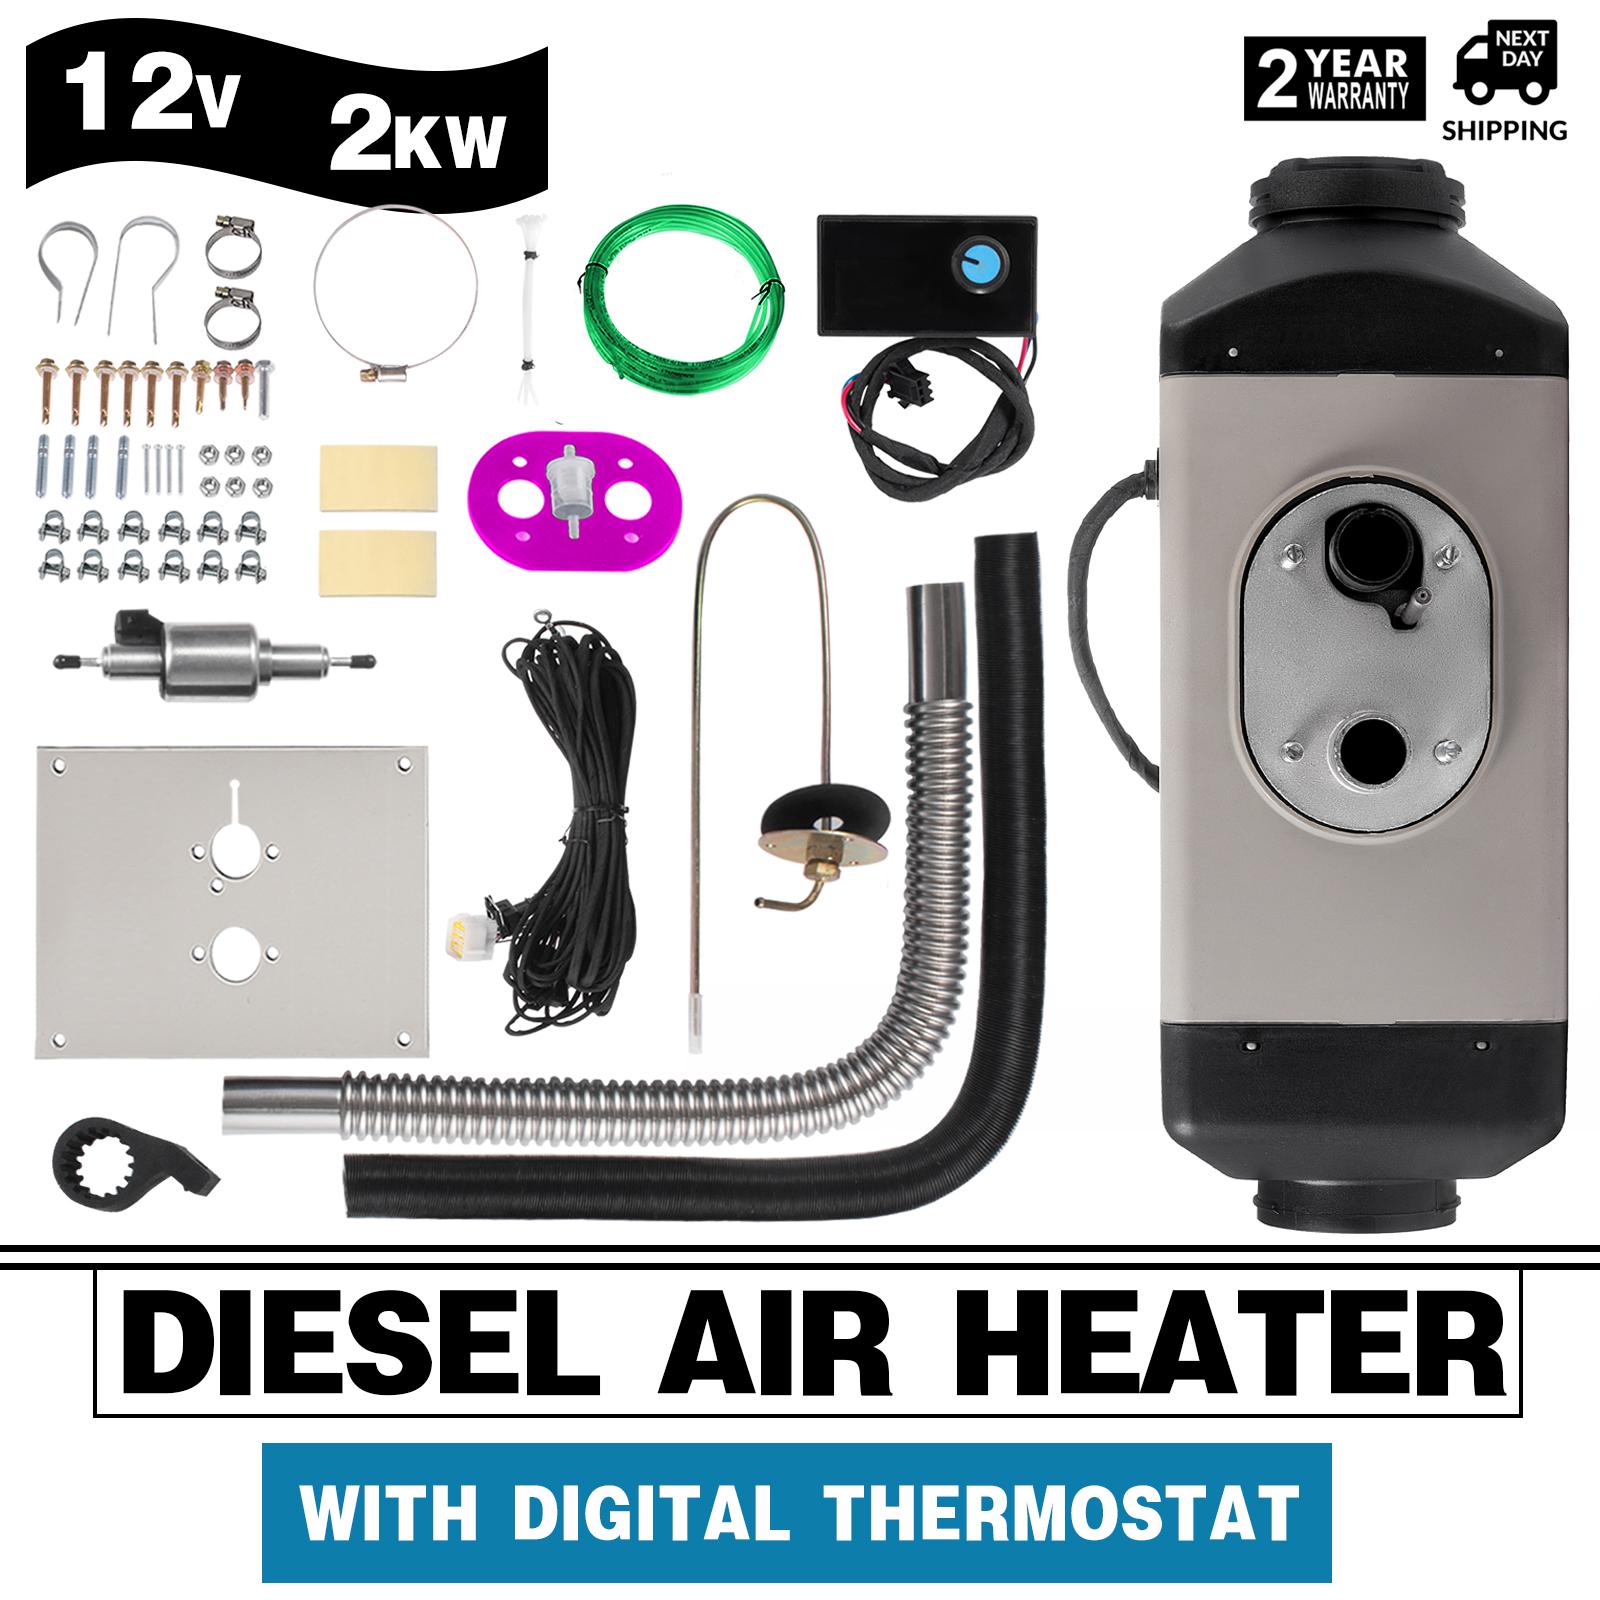 2kw 12v luftheizung standheizung air diesel heizger t f r. Black Bedroom Furniture Sets. Home Design Ideas